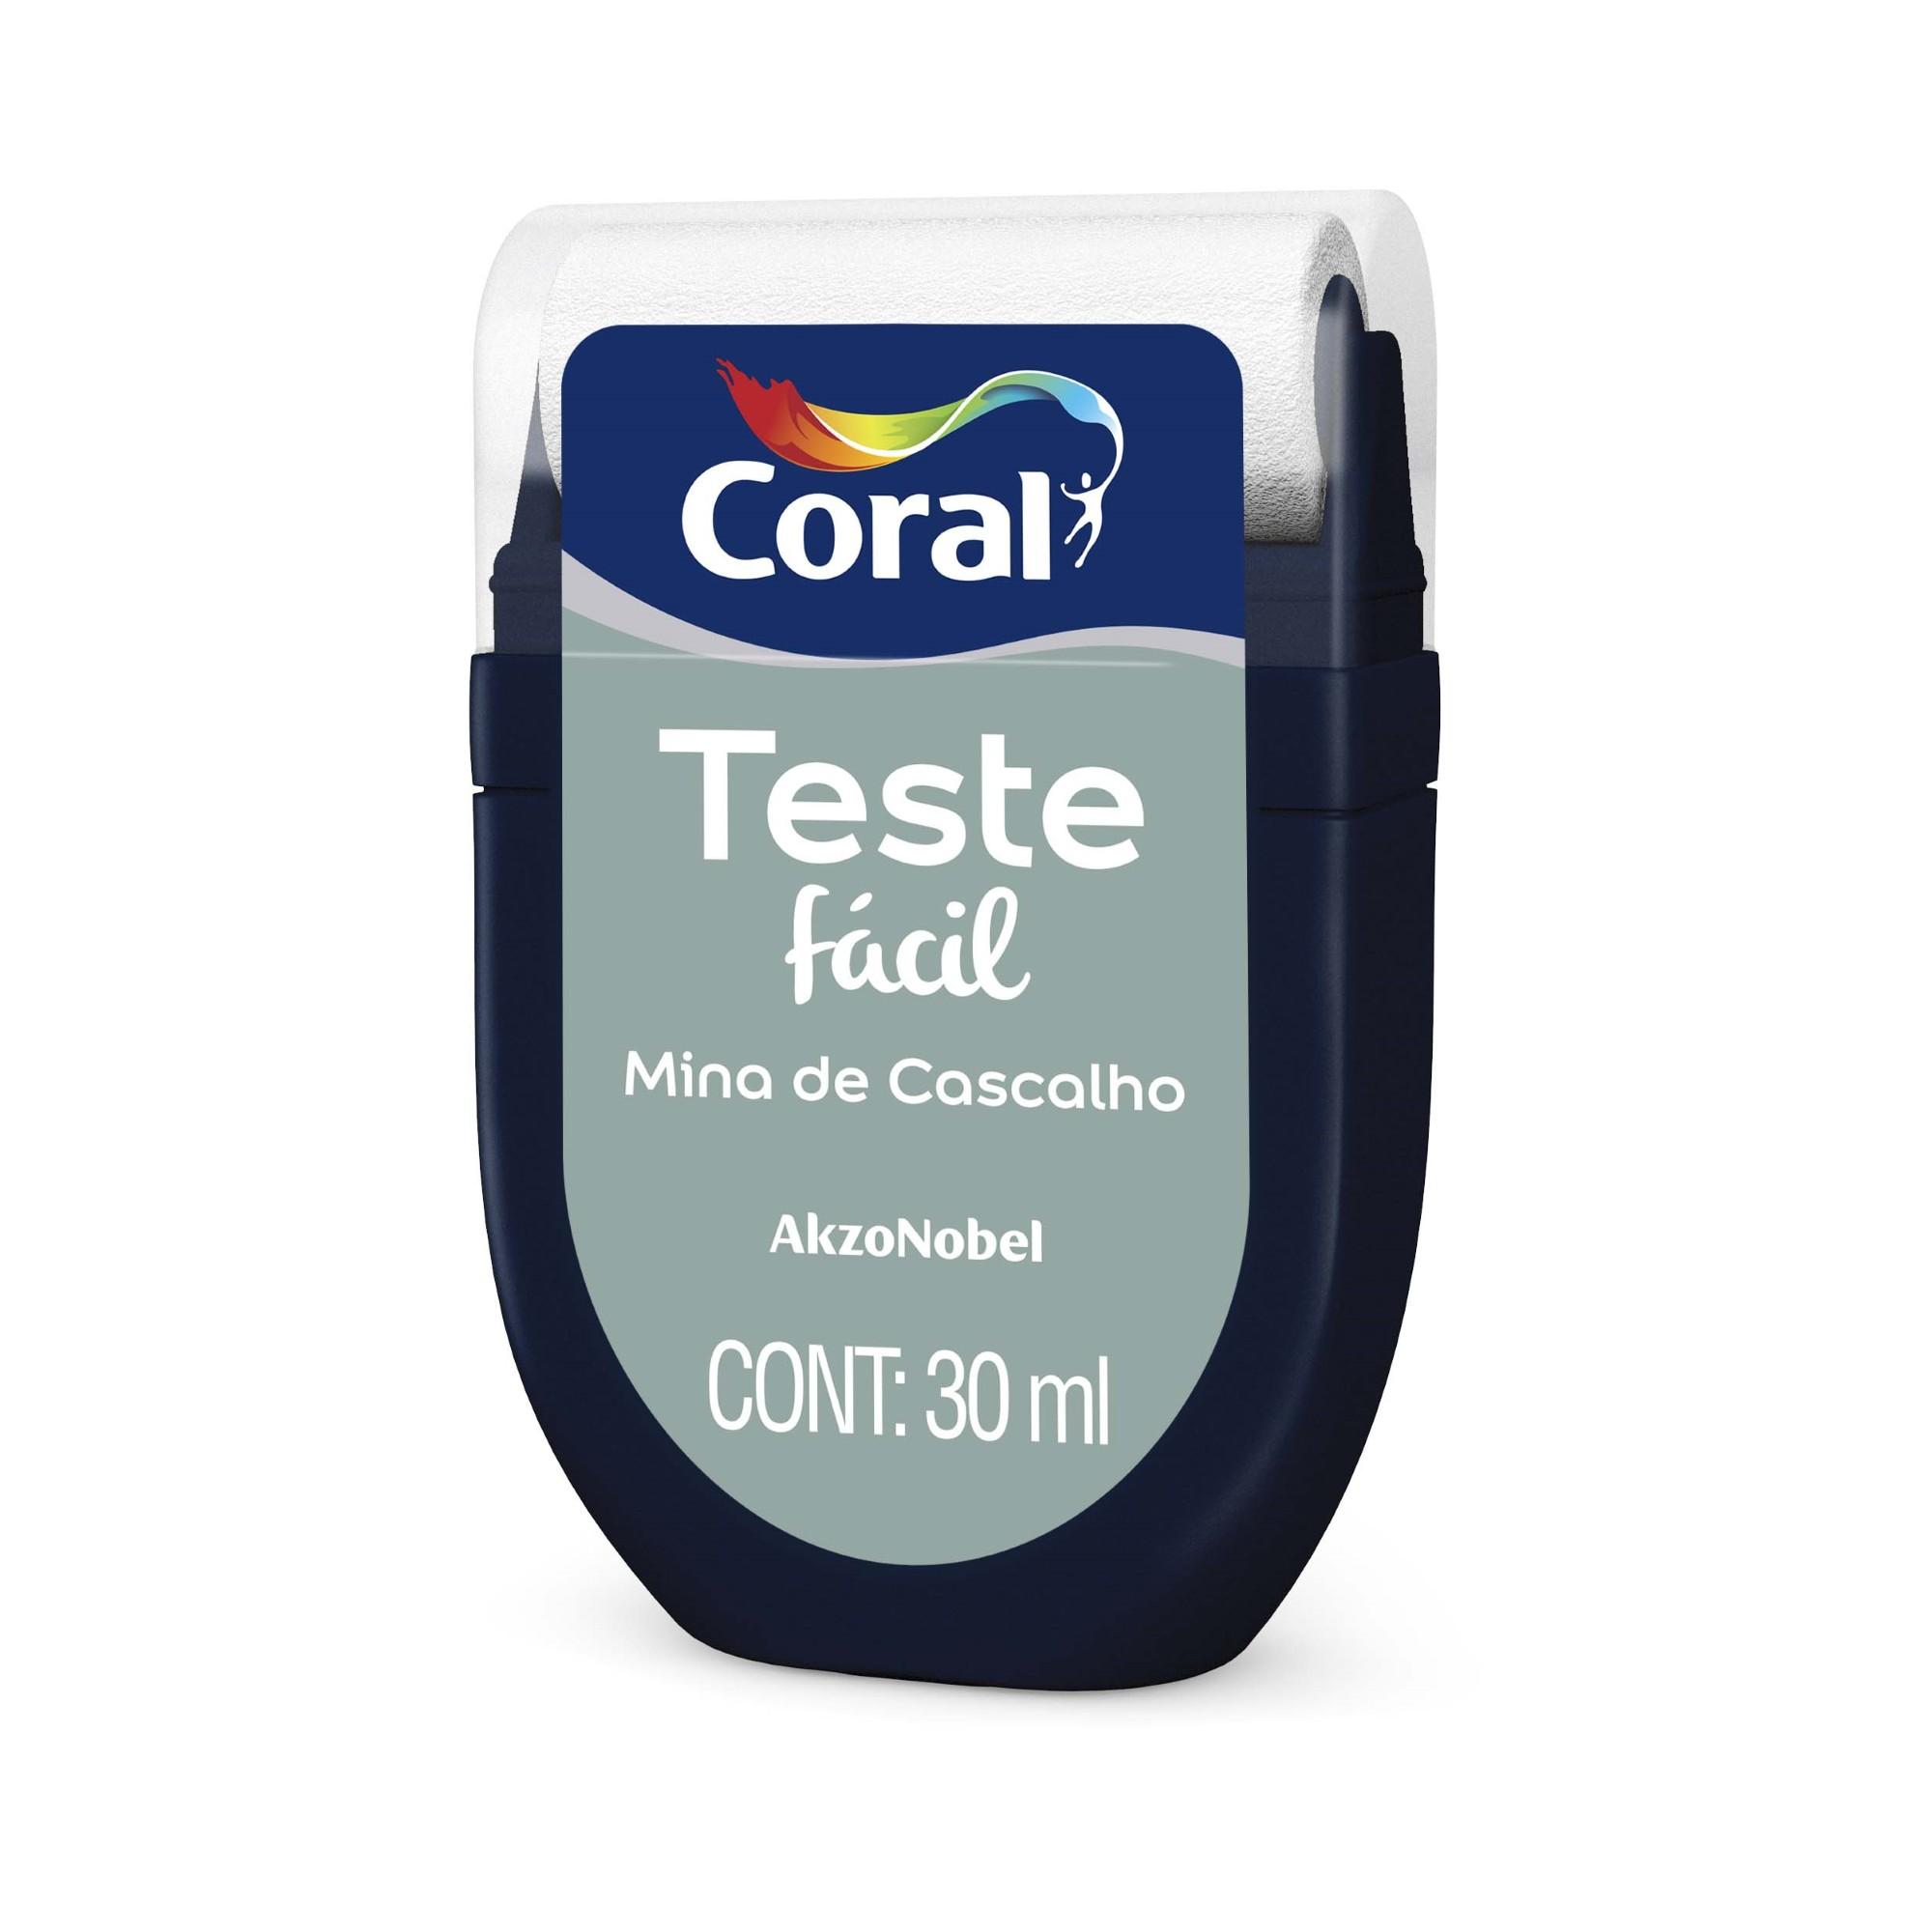 Teste Facil 30ml Mina de Cascalho - Coral